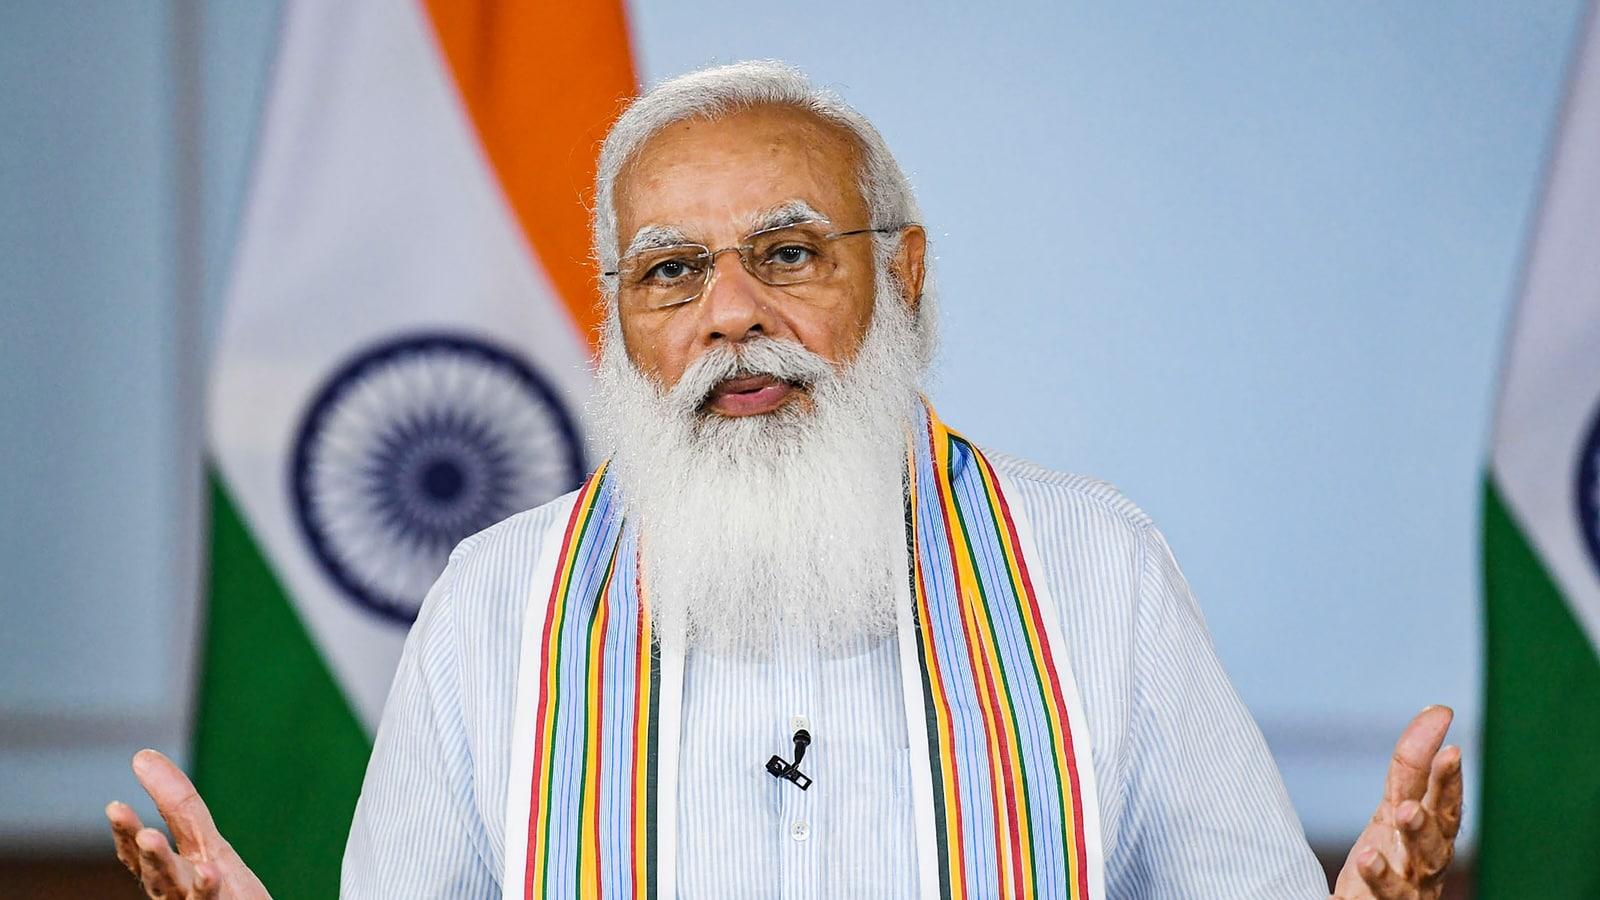 International Day of Yoga on Monday: PM Modi to address nation at 6:30am